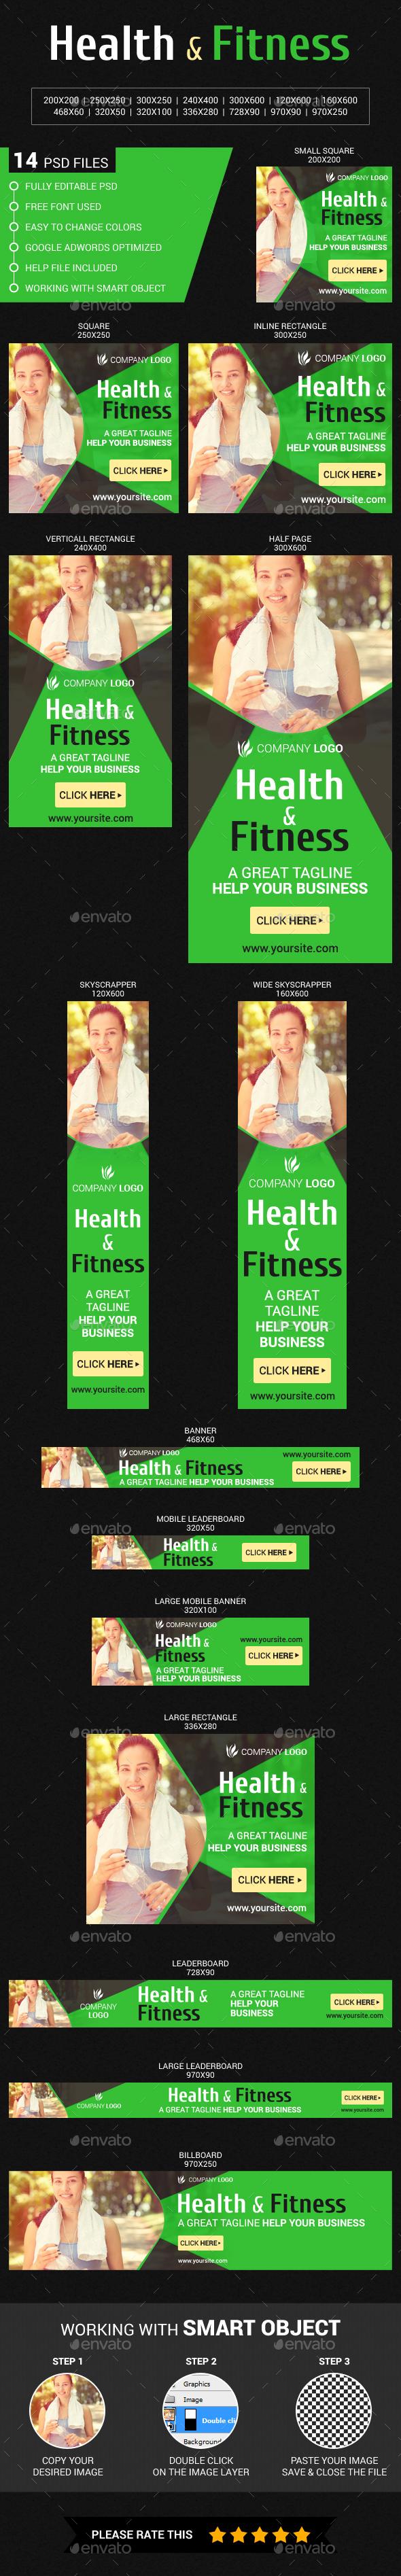 Health & Fitness 2